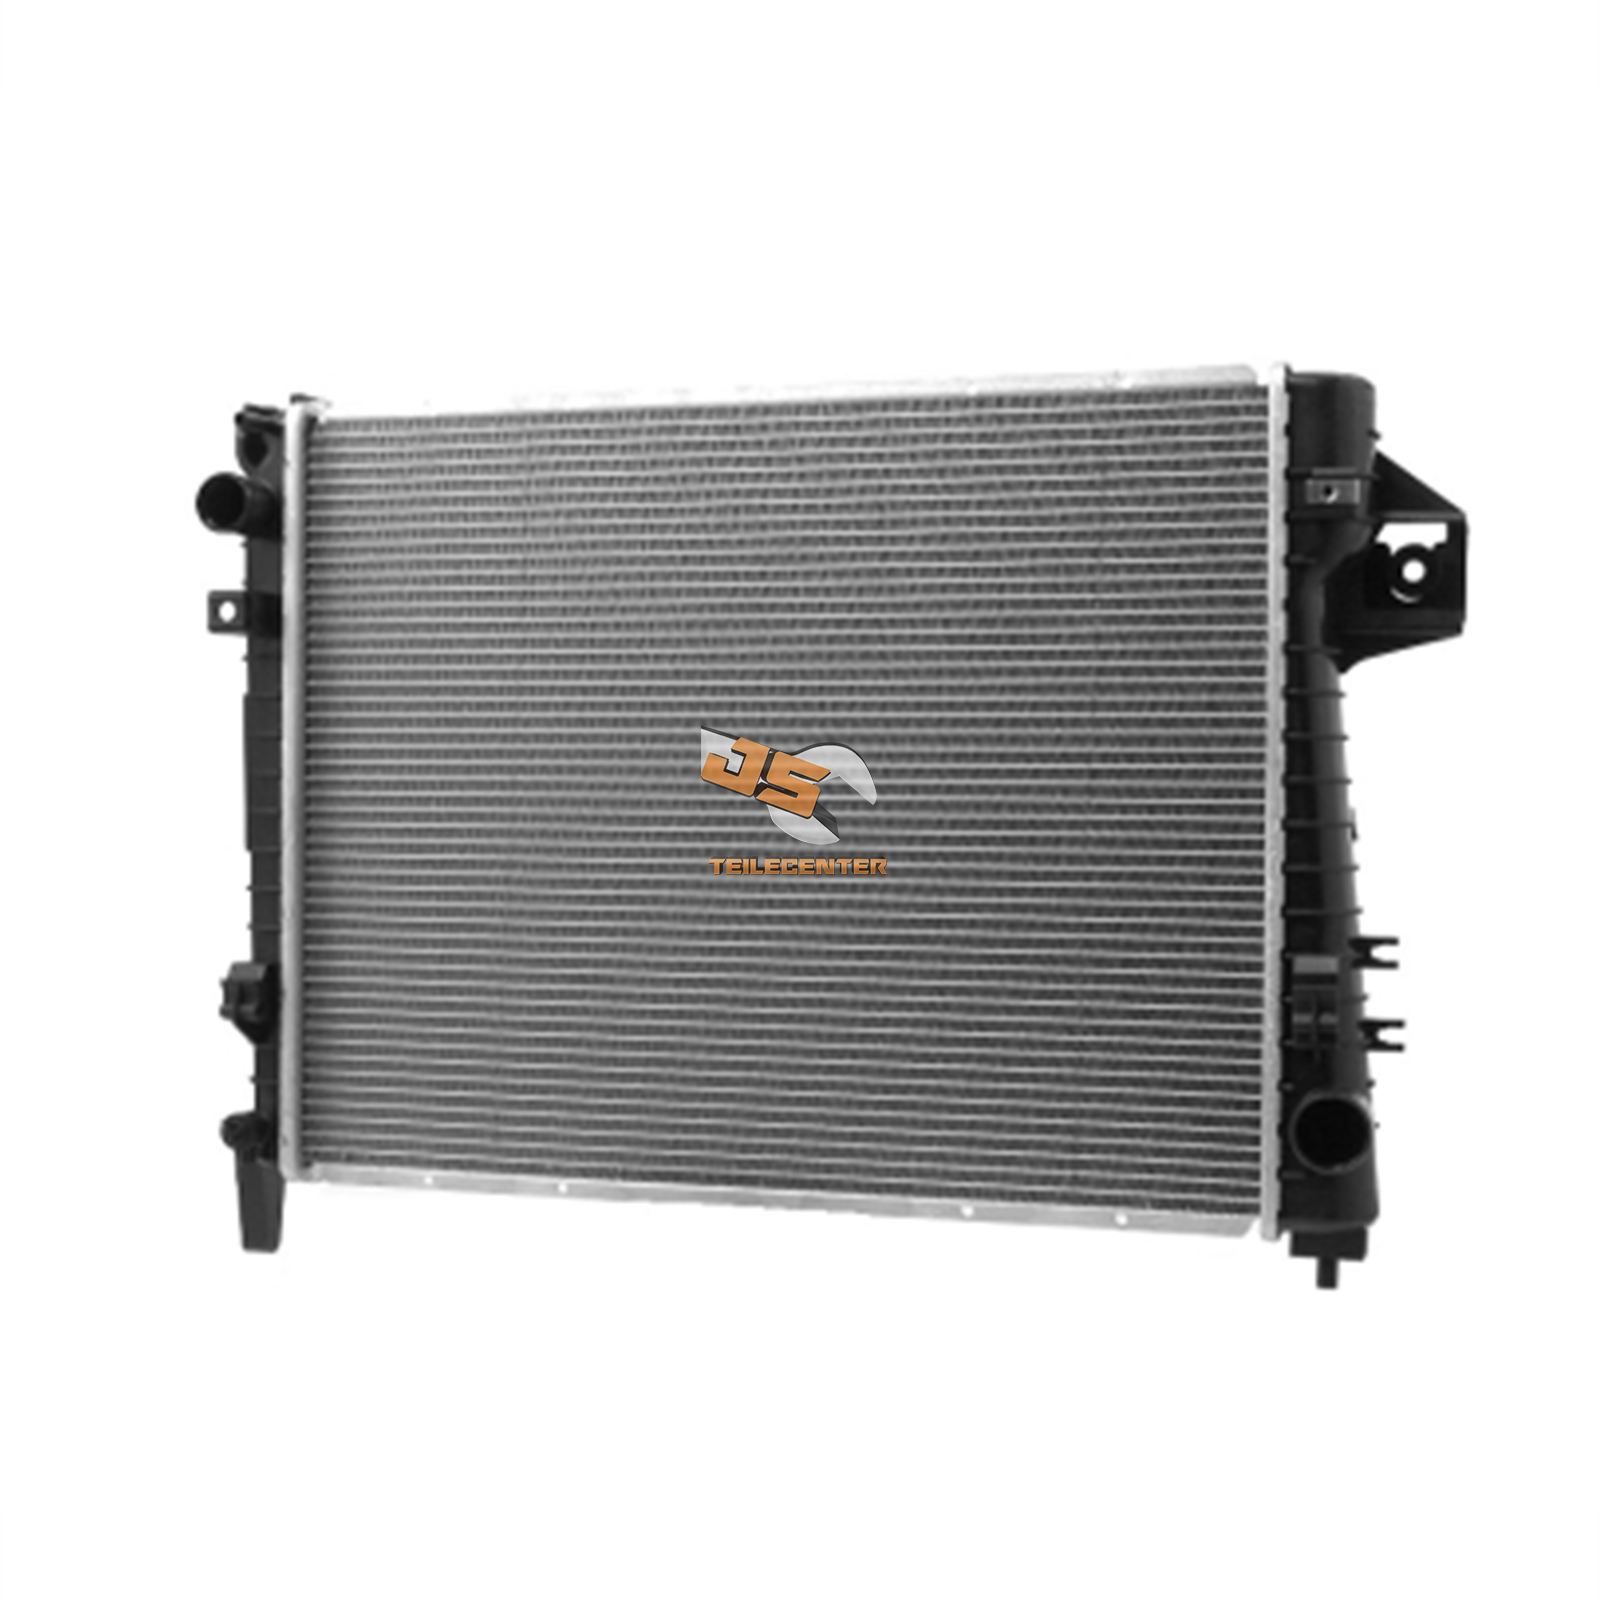 Kühler Wasserkühler Dodge RAM 1500 Pick-up 4.7 4x4